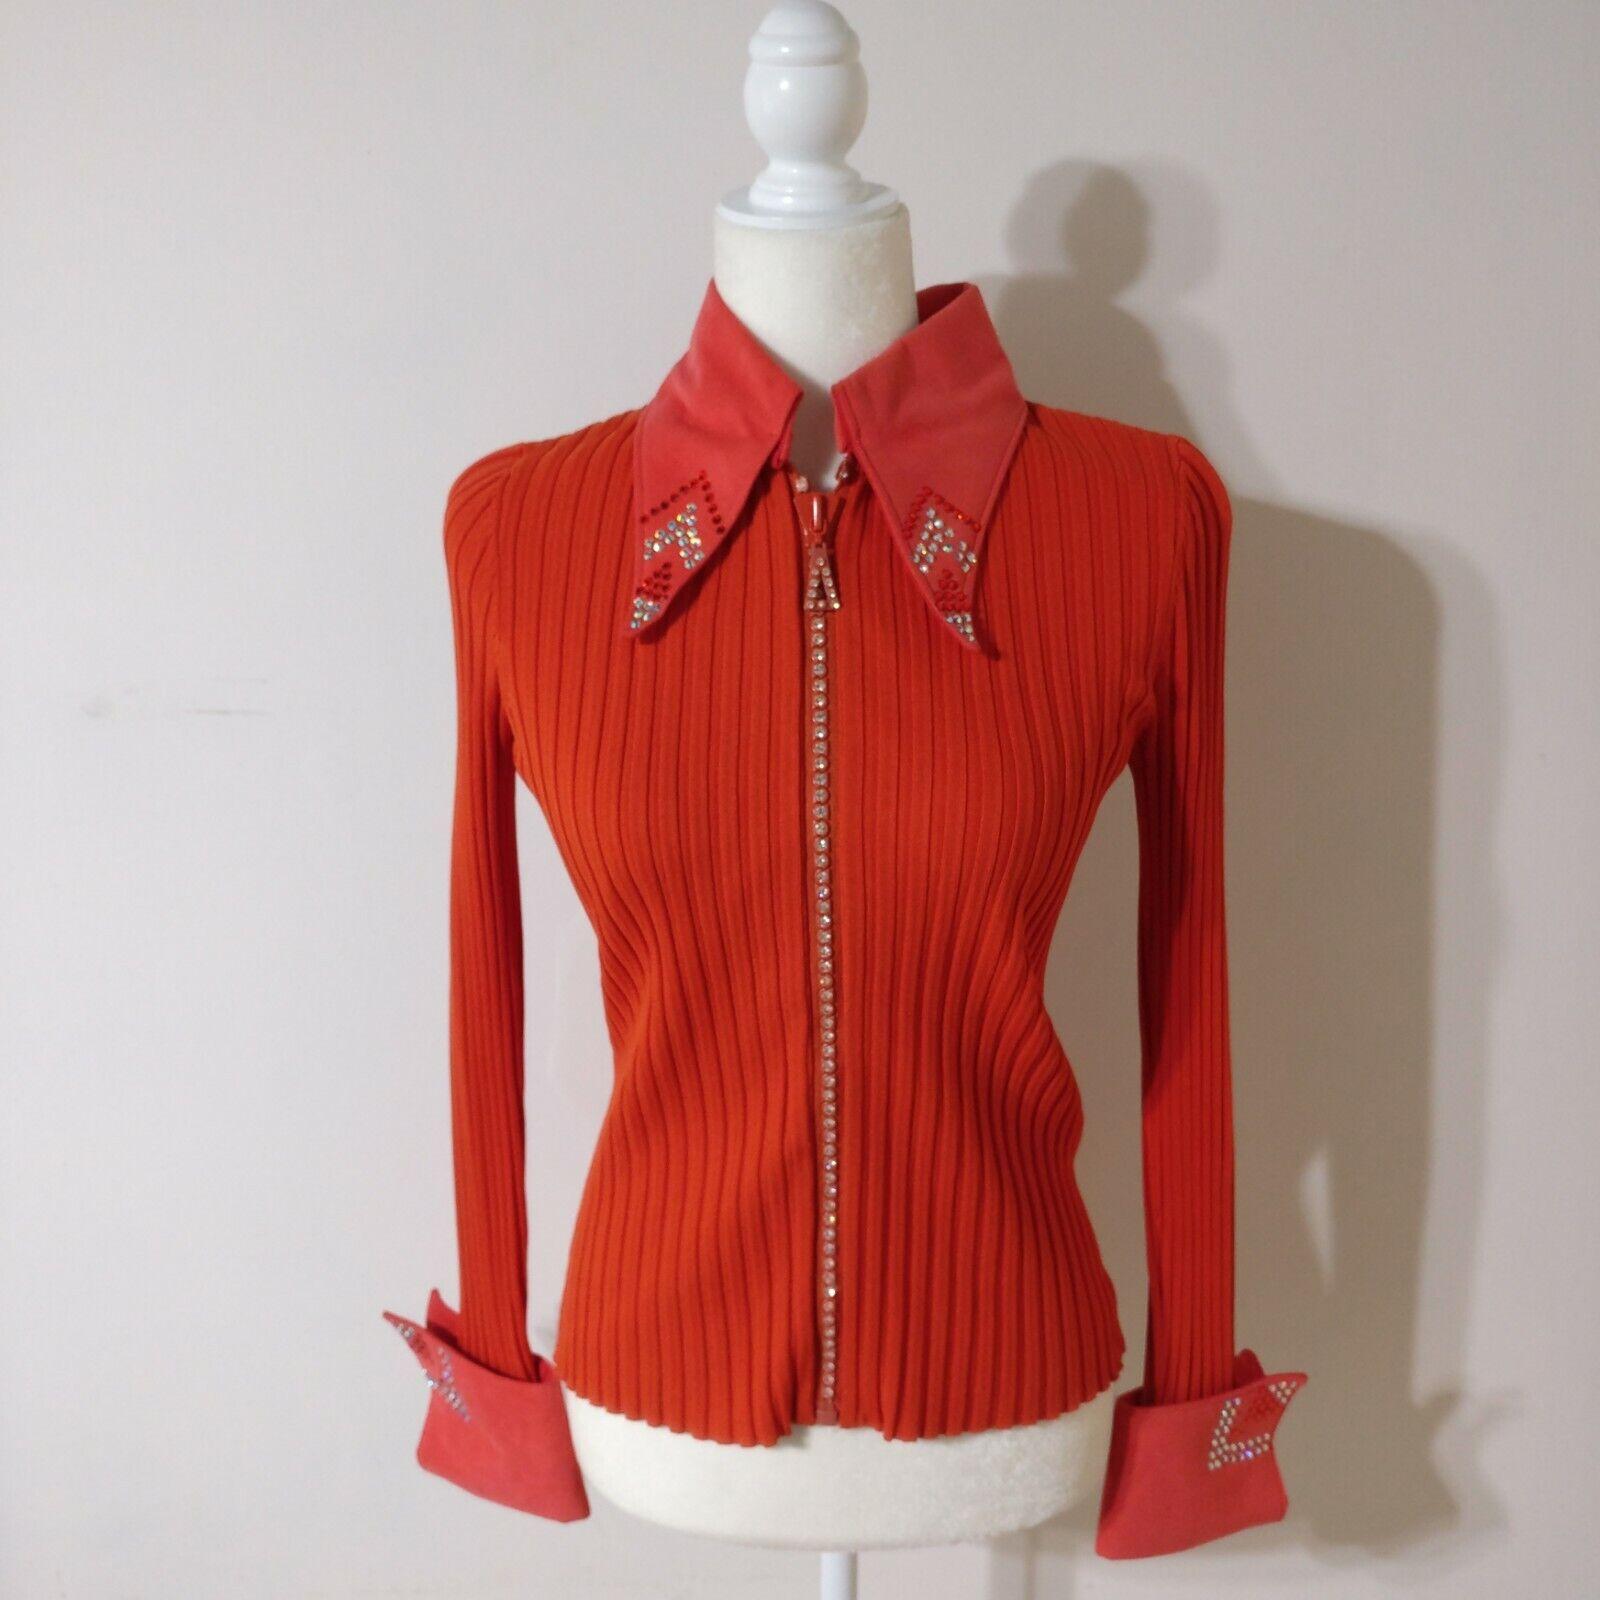 Western Pleasure Rail mostrare Shirt Jacket Med arancia Sweater Crystal Embellished